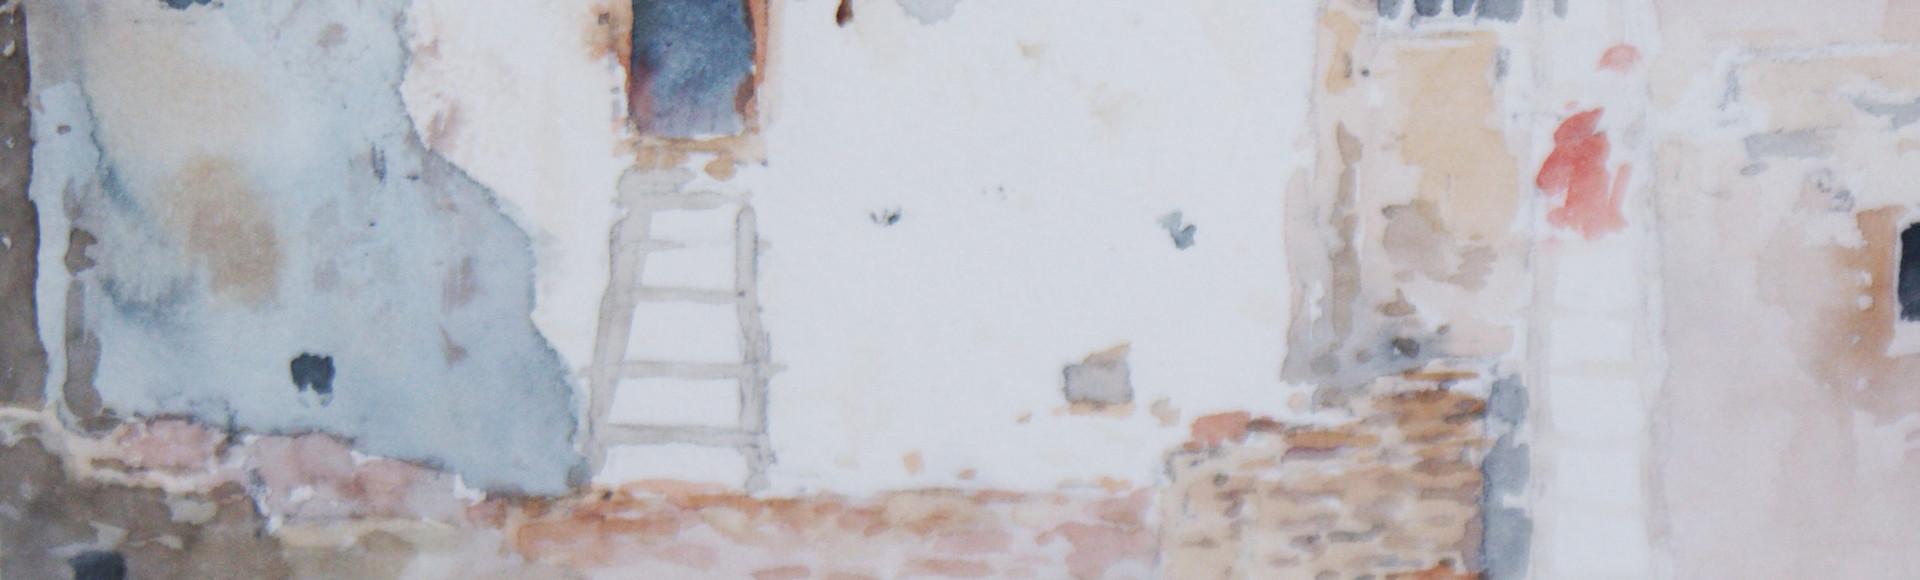 Frank Paul Sauerwein (1871-1910) Taos, NM Adobe Watercolor on Paper Circa 1890's